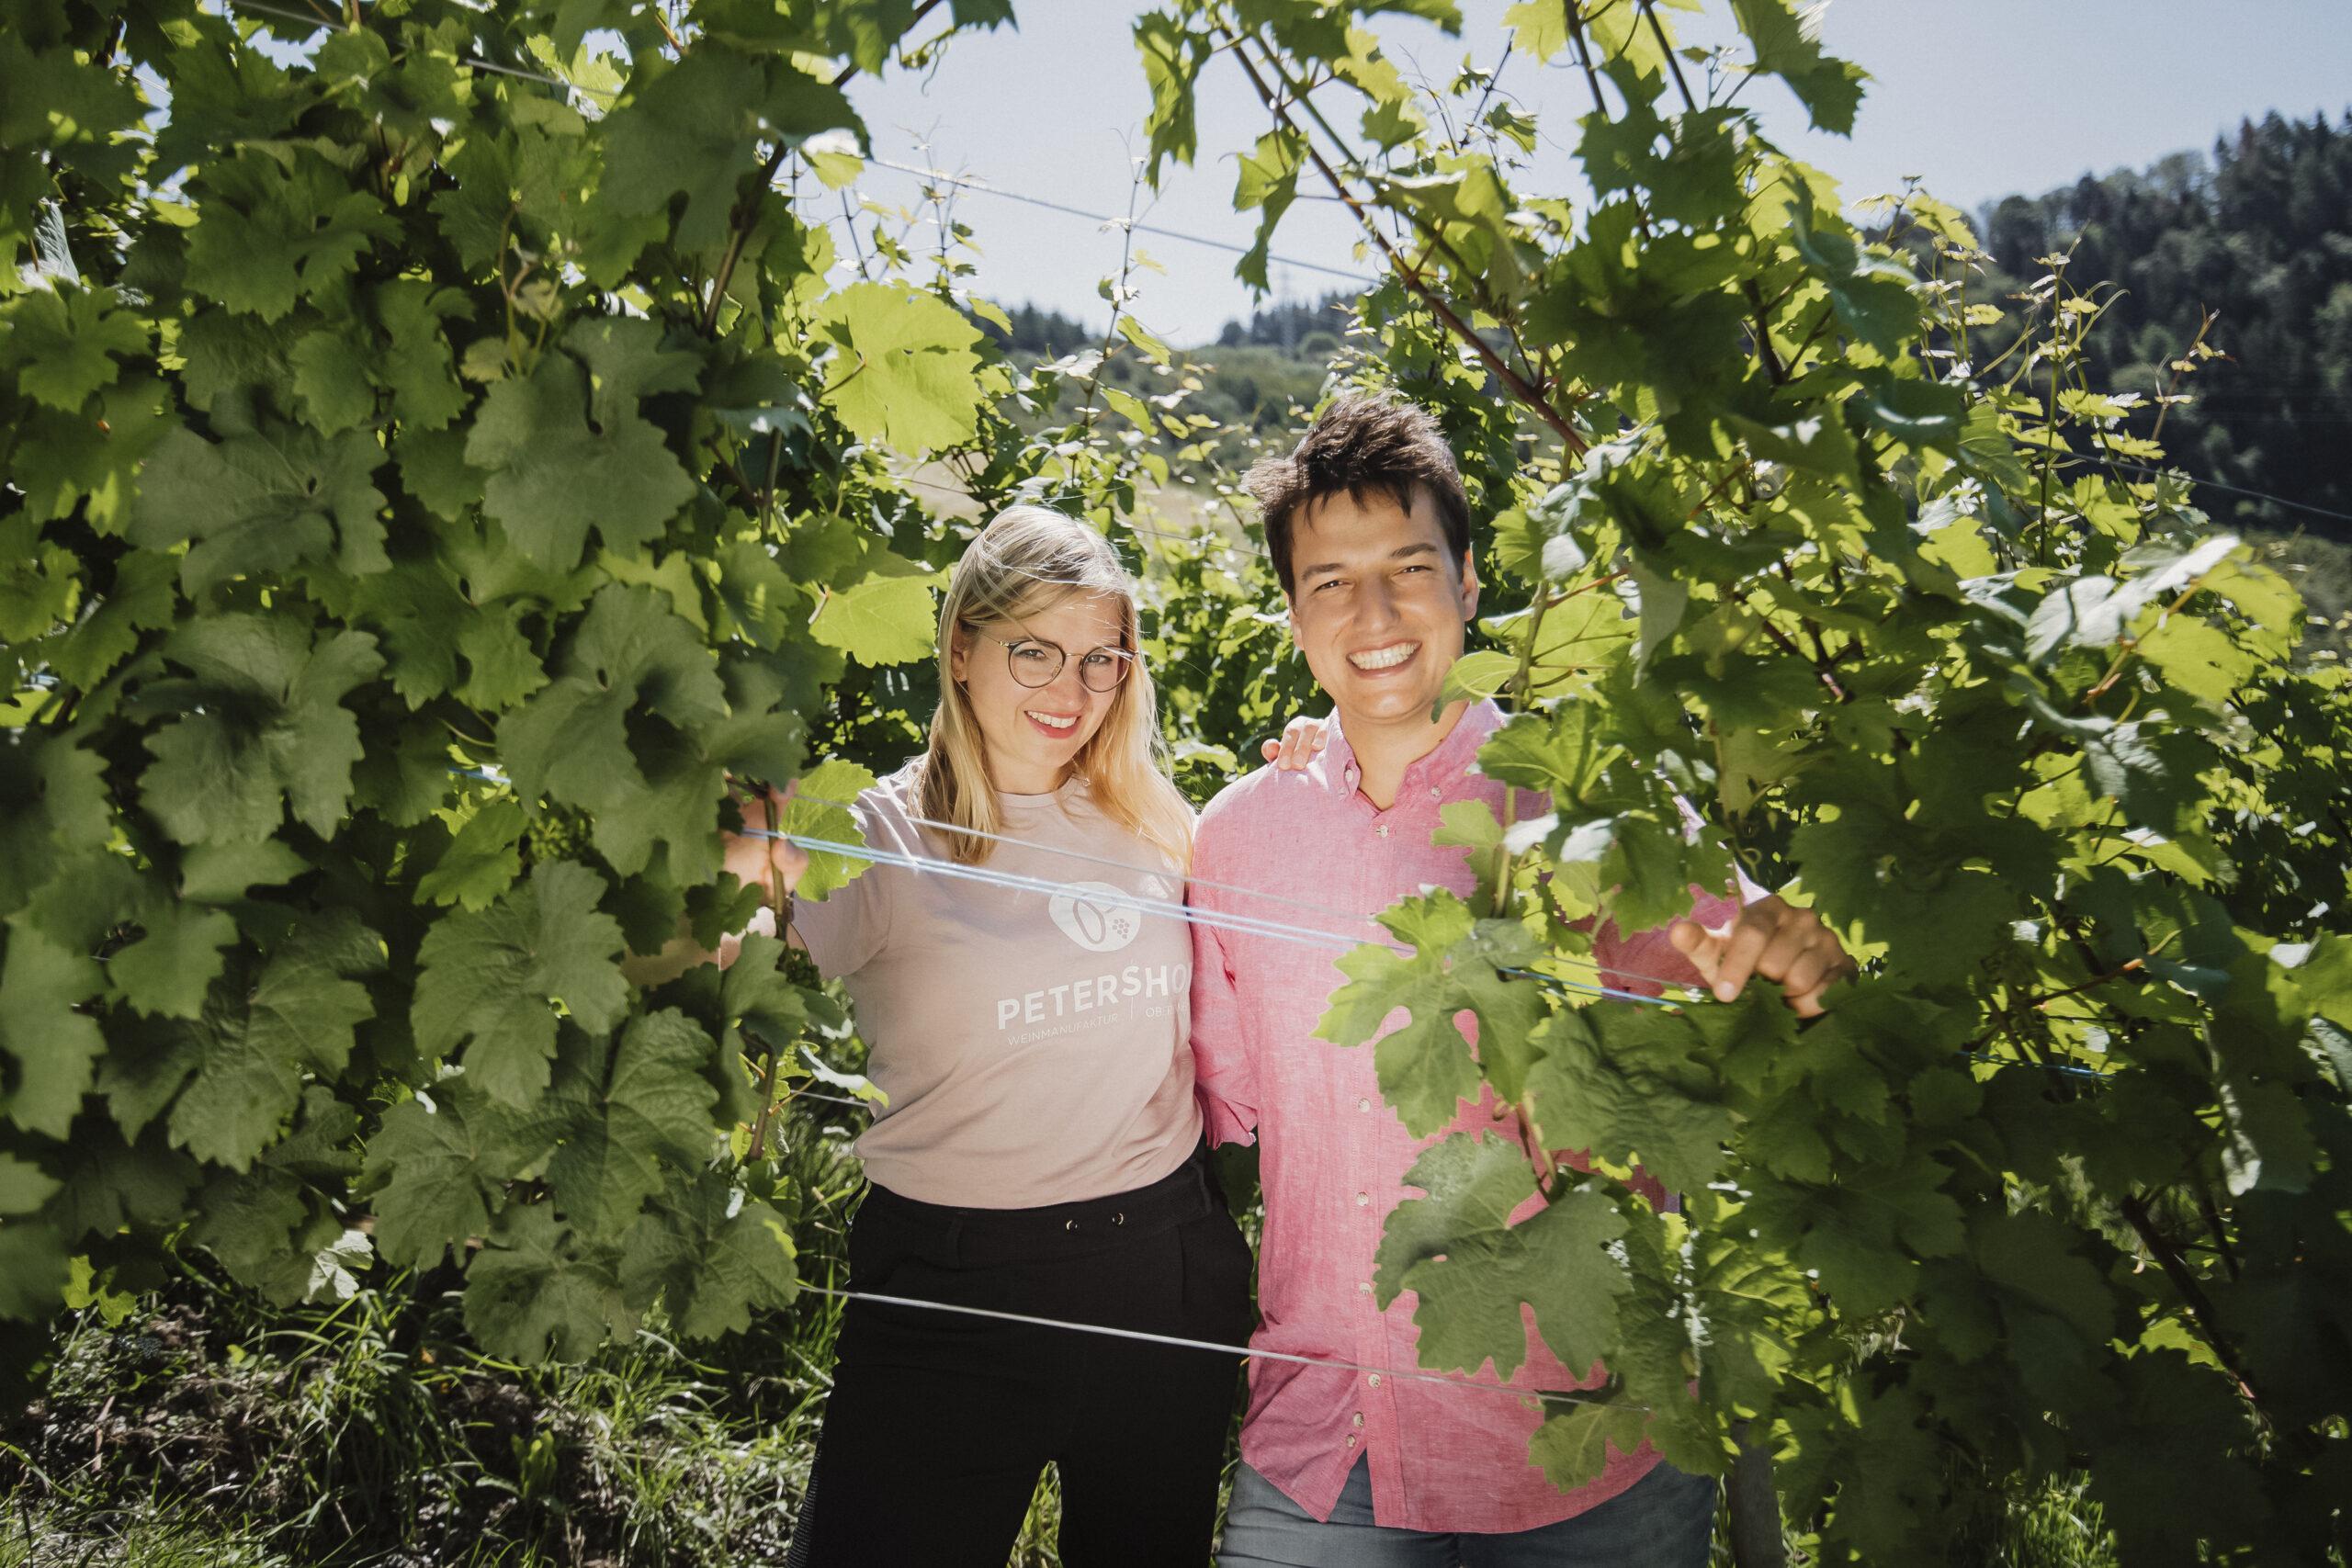 Weinmanufaktur Petershof (Nelly Theobald und Peter Thelen) fotografiert am 18.07.2021 in Oberemmel.